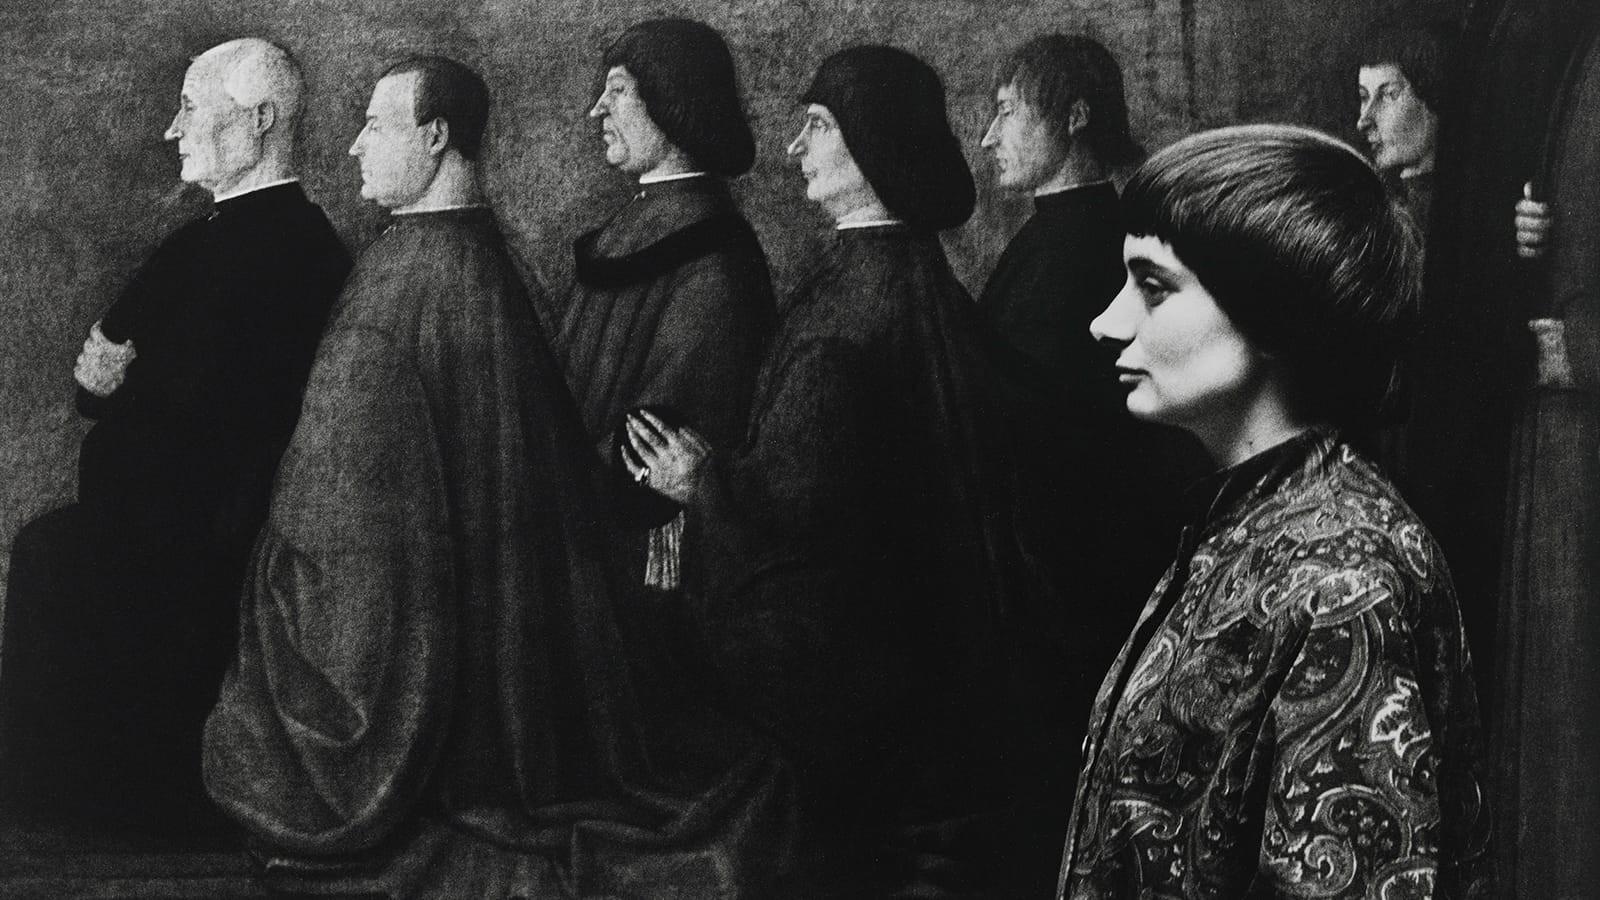 Gleaner's Art: An Agnès Varda Exhibition